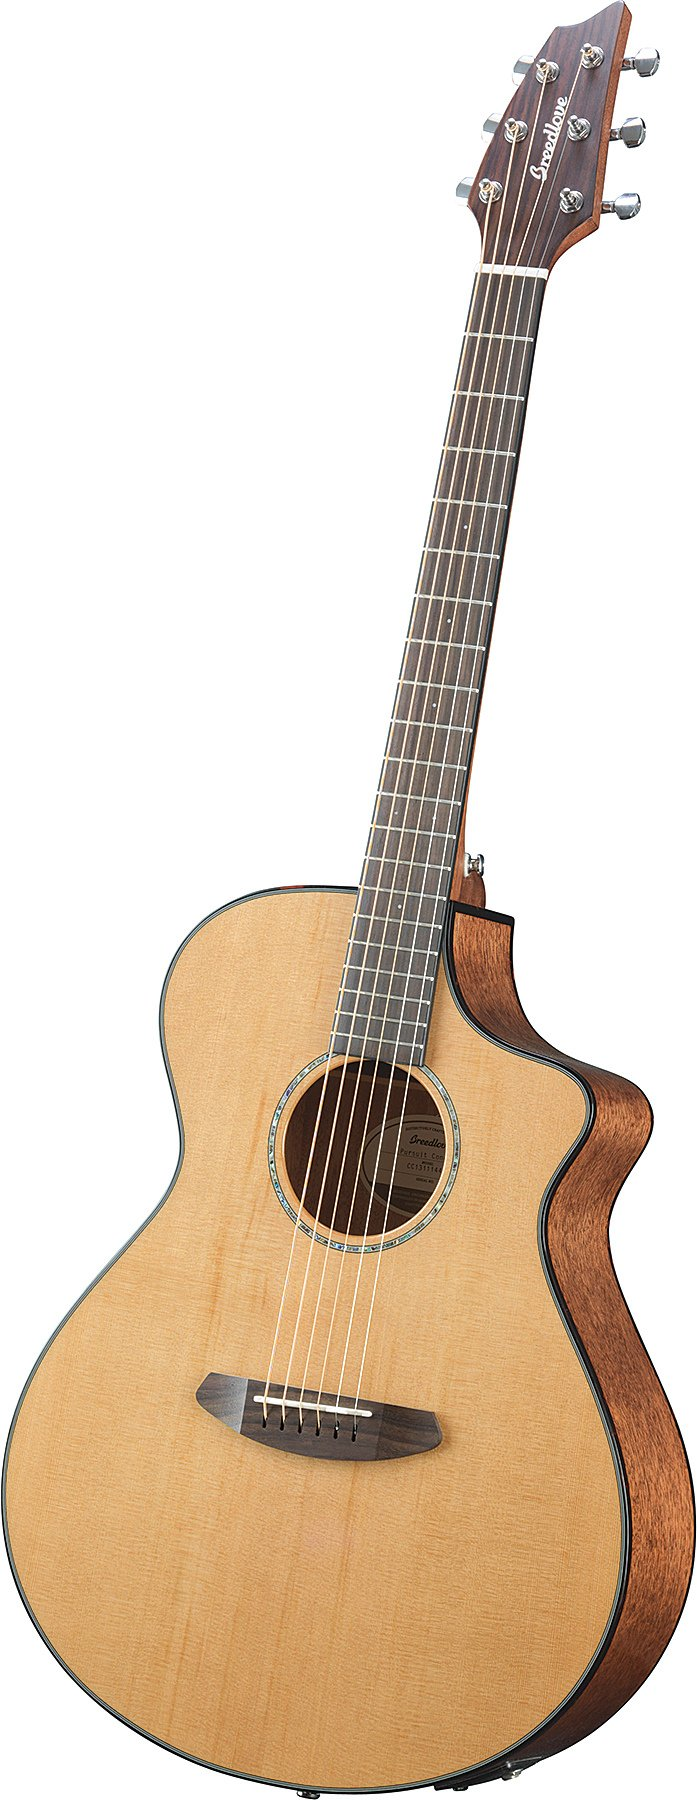 Acoustic-Electric Guitar